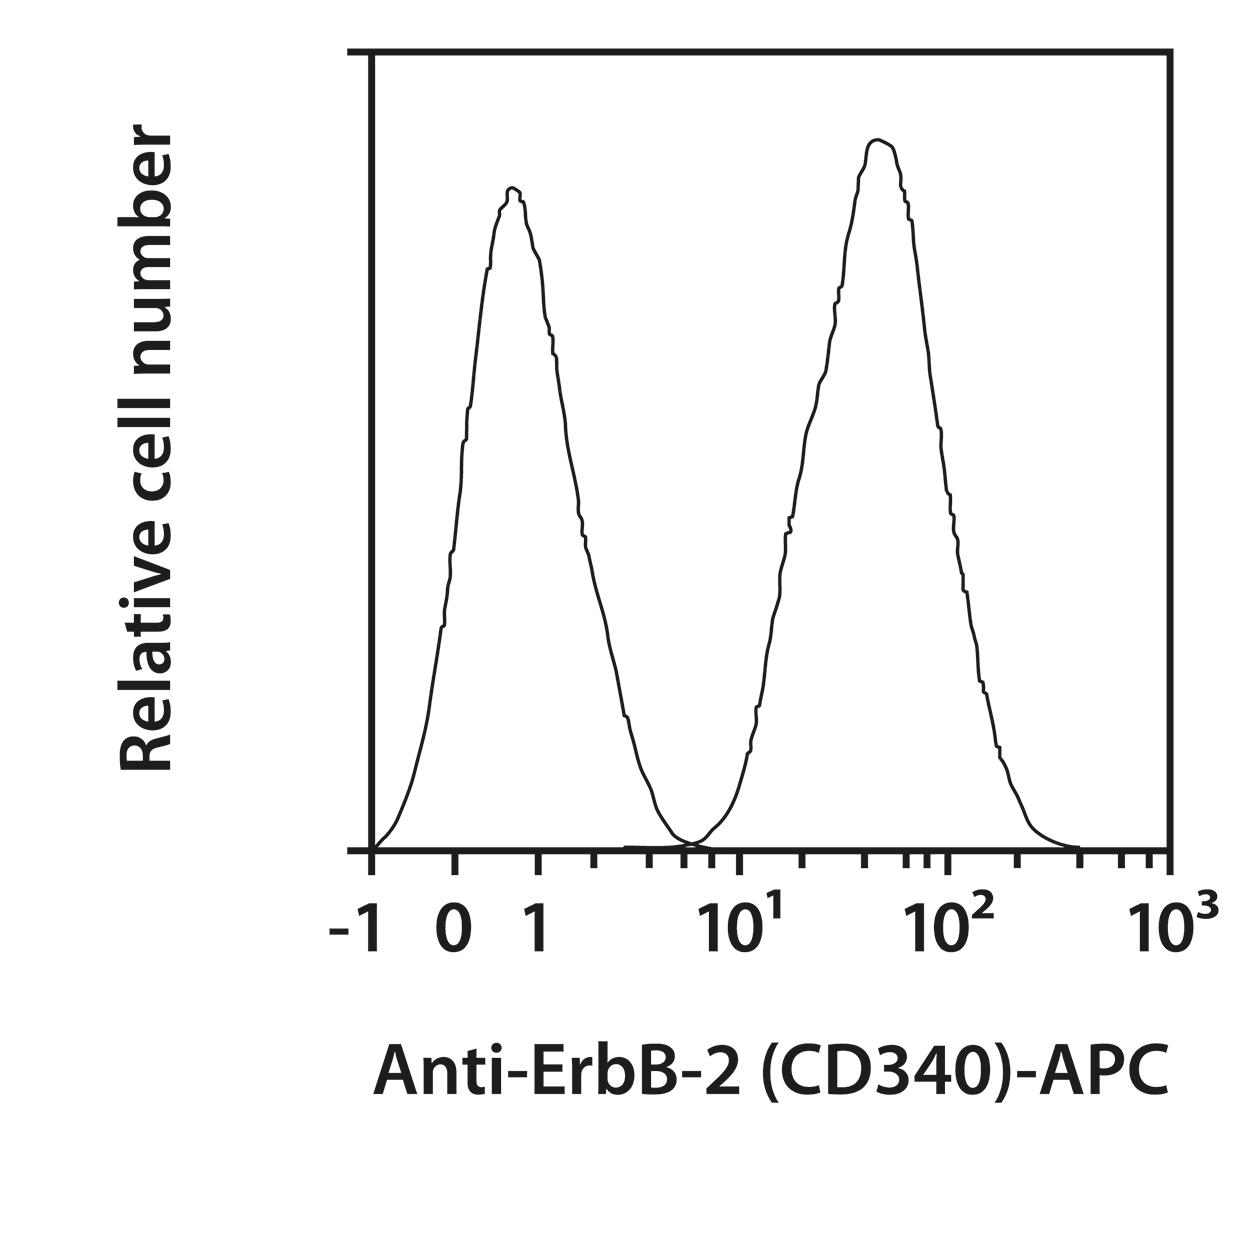 ErbB-2 (CD340) Antibody, anti-human, REAfinity™